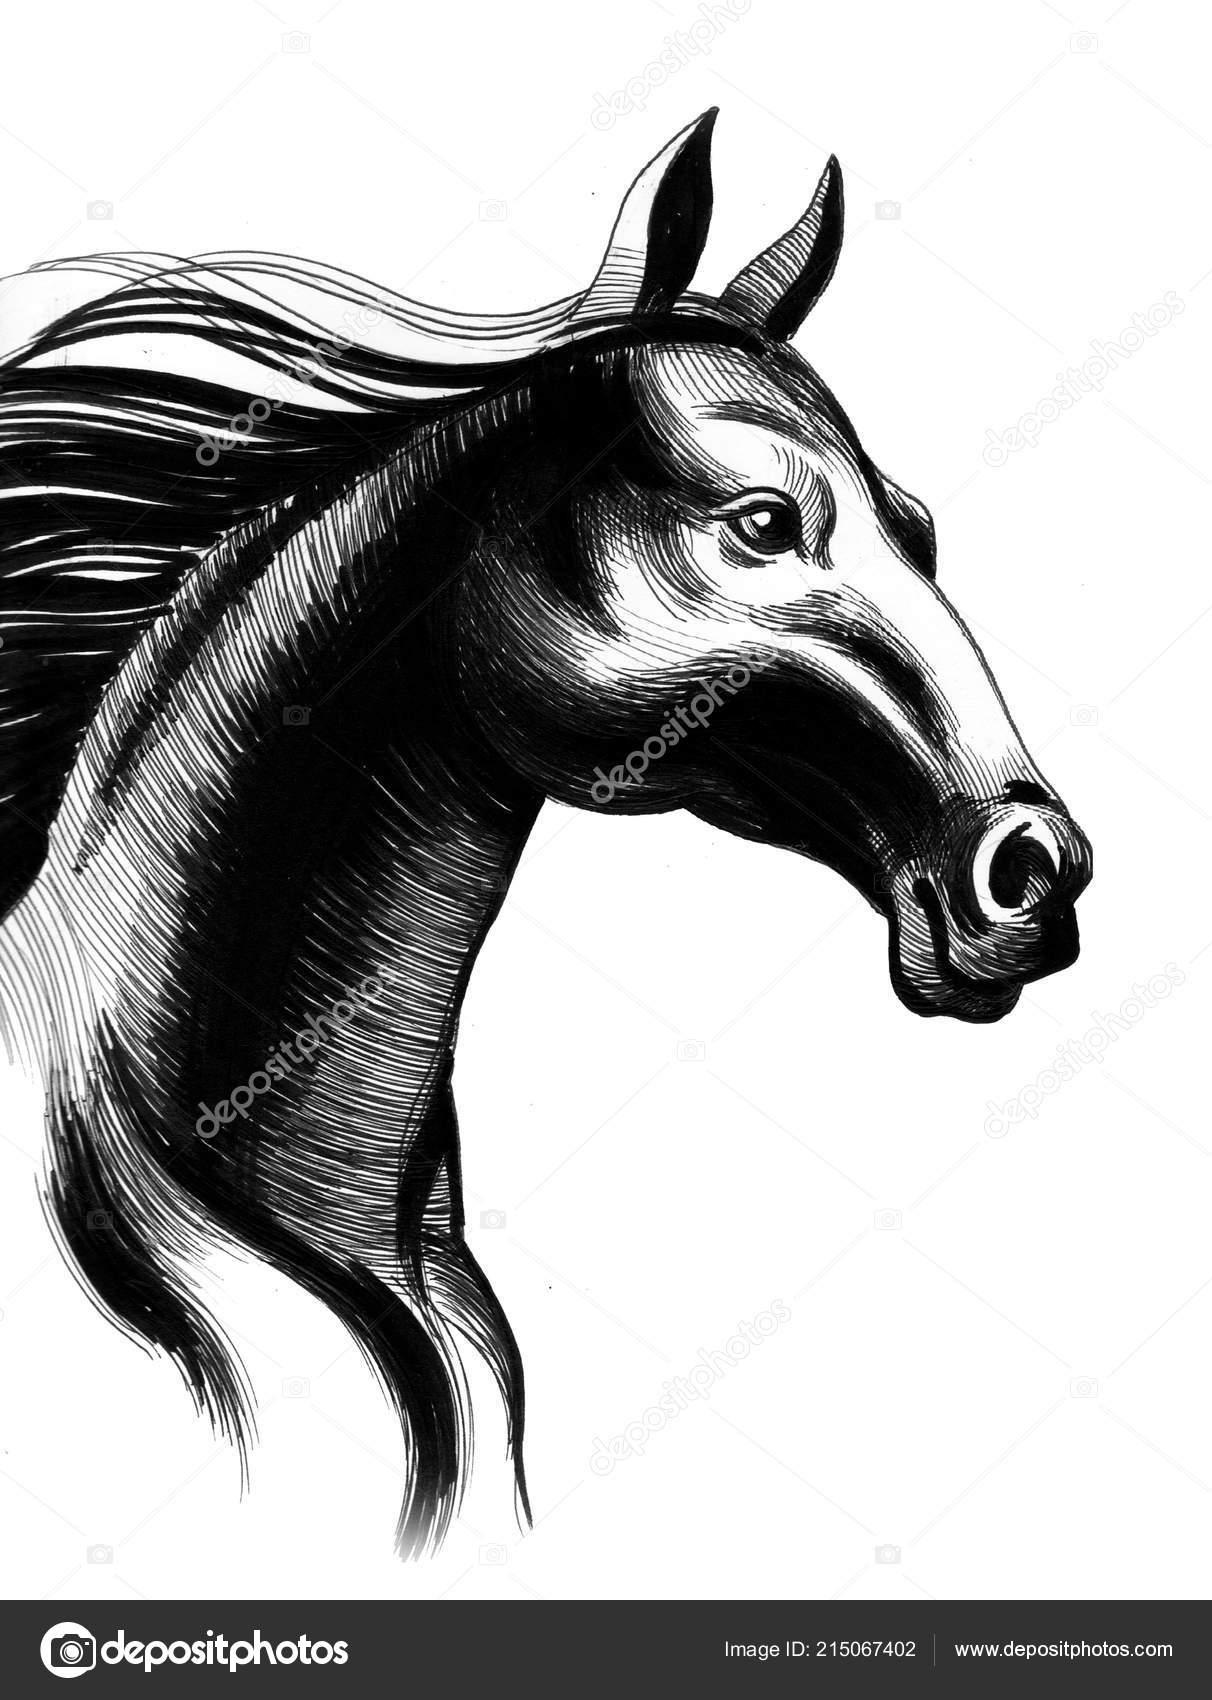 Black Horse Head White Background Ink Illustration Stock Photo C Alexblacksea 215067402